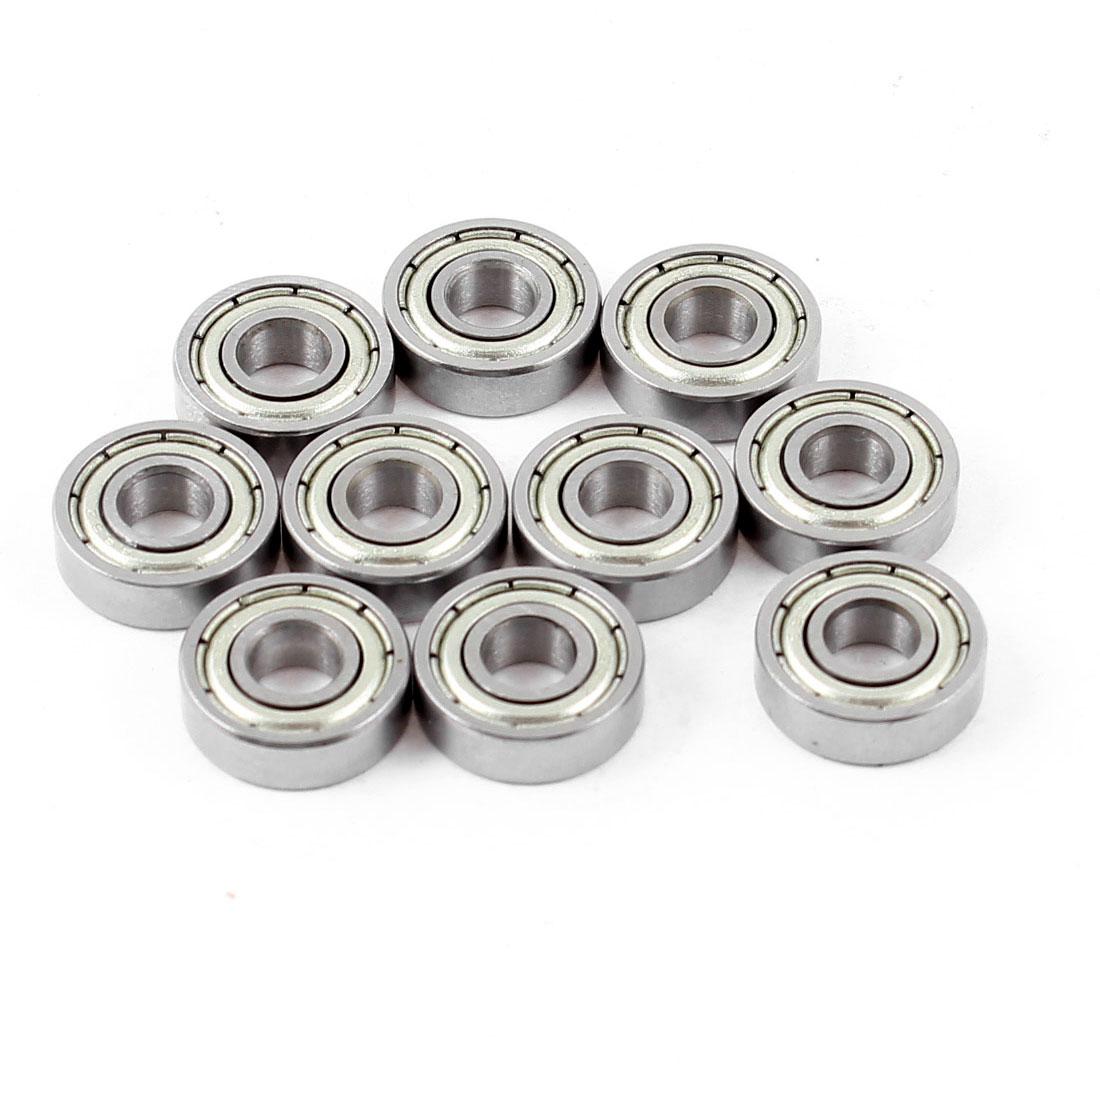 10 Pcs 695Z Dual Metal Shields Deep Groove Ball Bearing 5mm x 13mm x 4mm